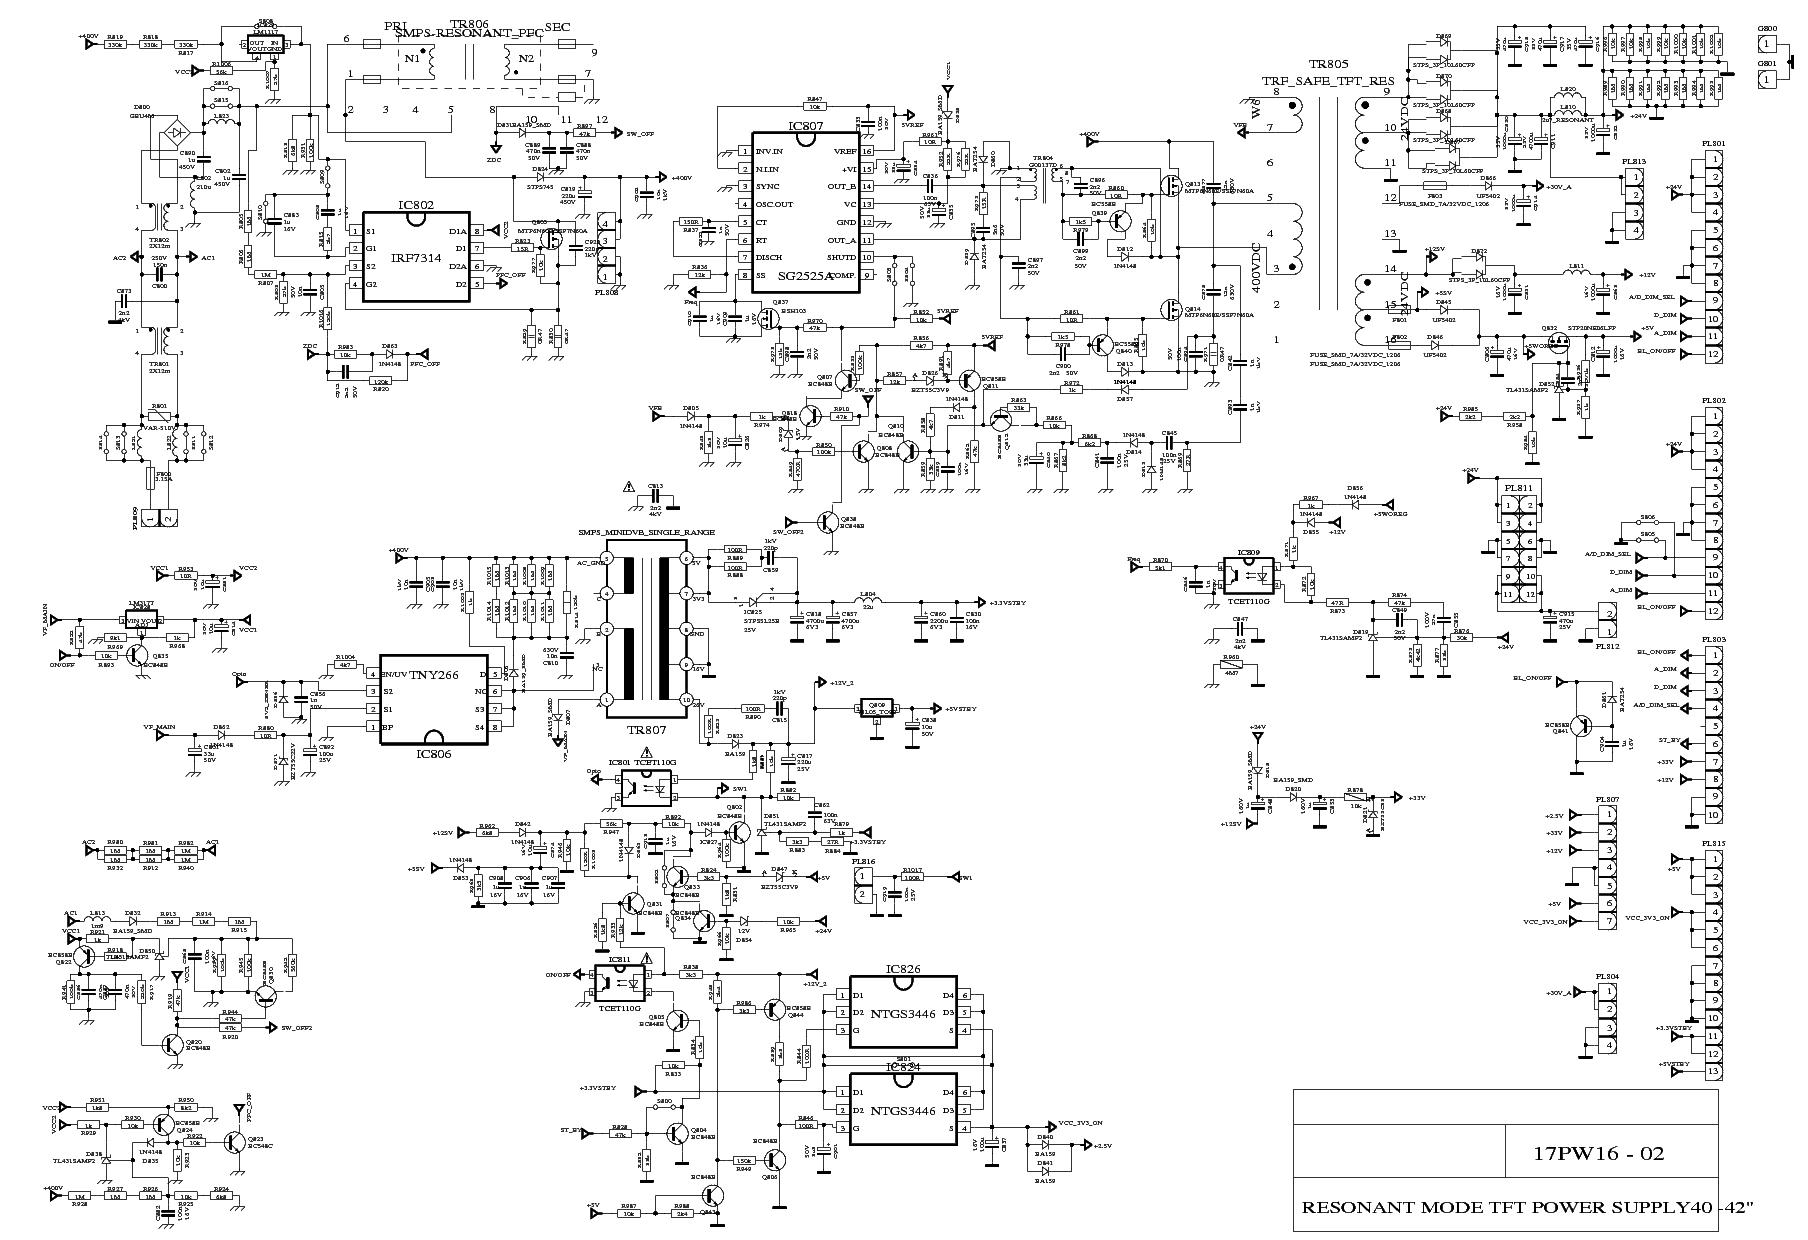 Strange Lcd Tv Schematics Auto Electrical Wiring Diagram Wiring Cloud Dulfrecoveryedborg